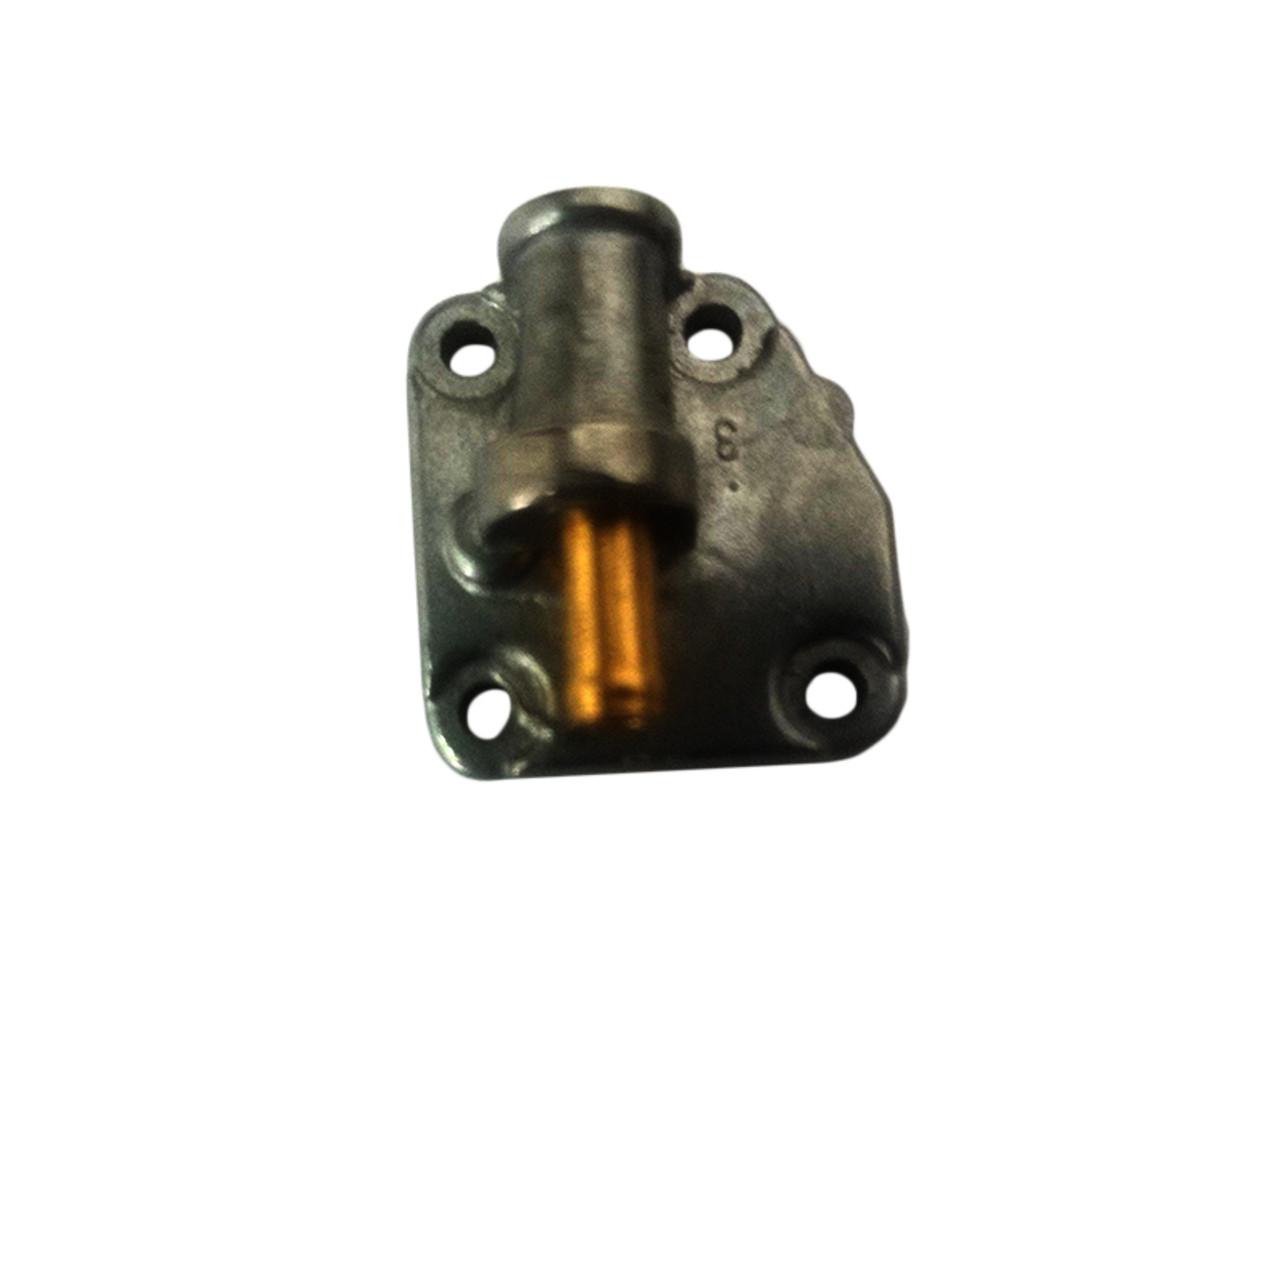 SHINDAIWA Pump Body P004001960 - Image 1